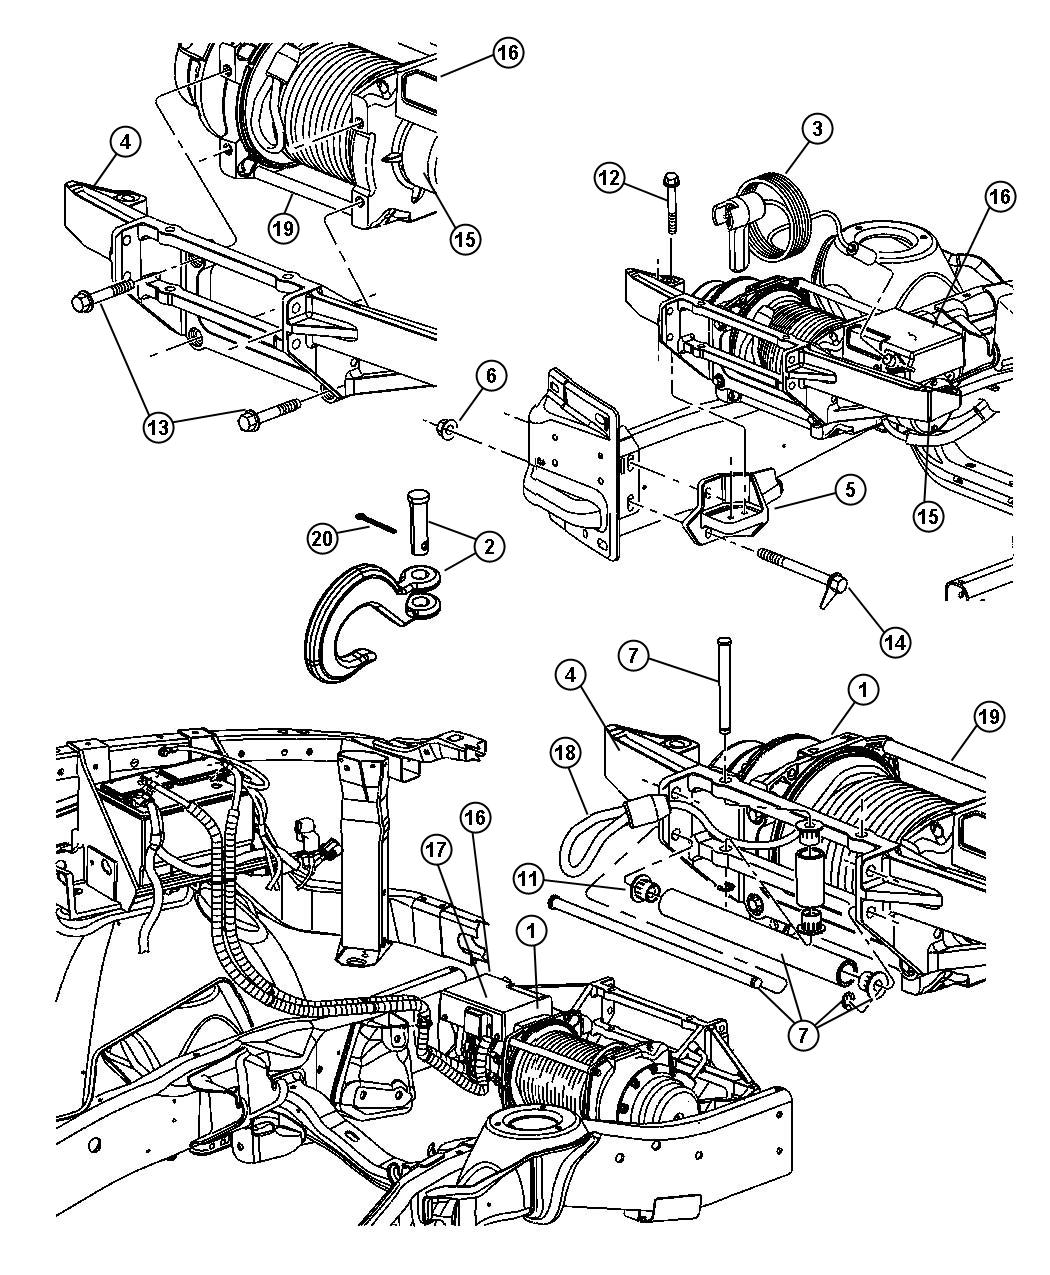 Dodge Ram 2500 Bracket. Winch. [front electric winch